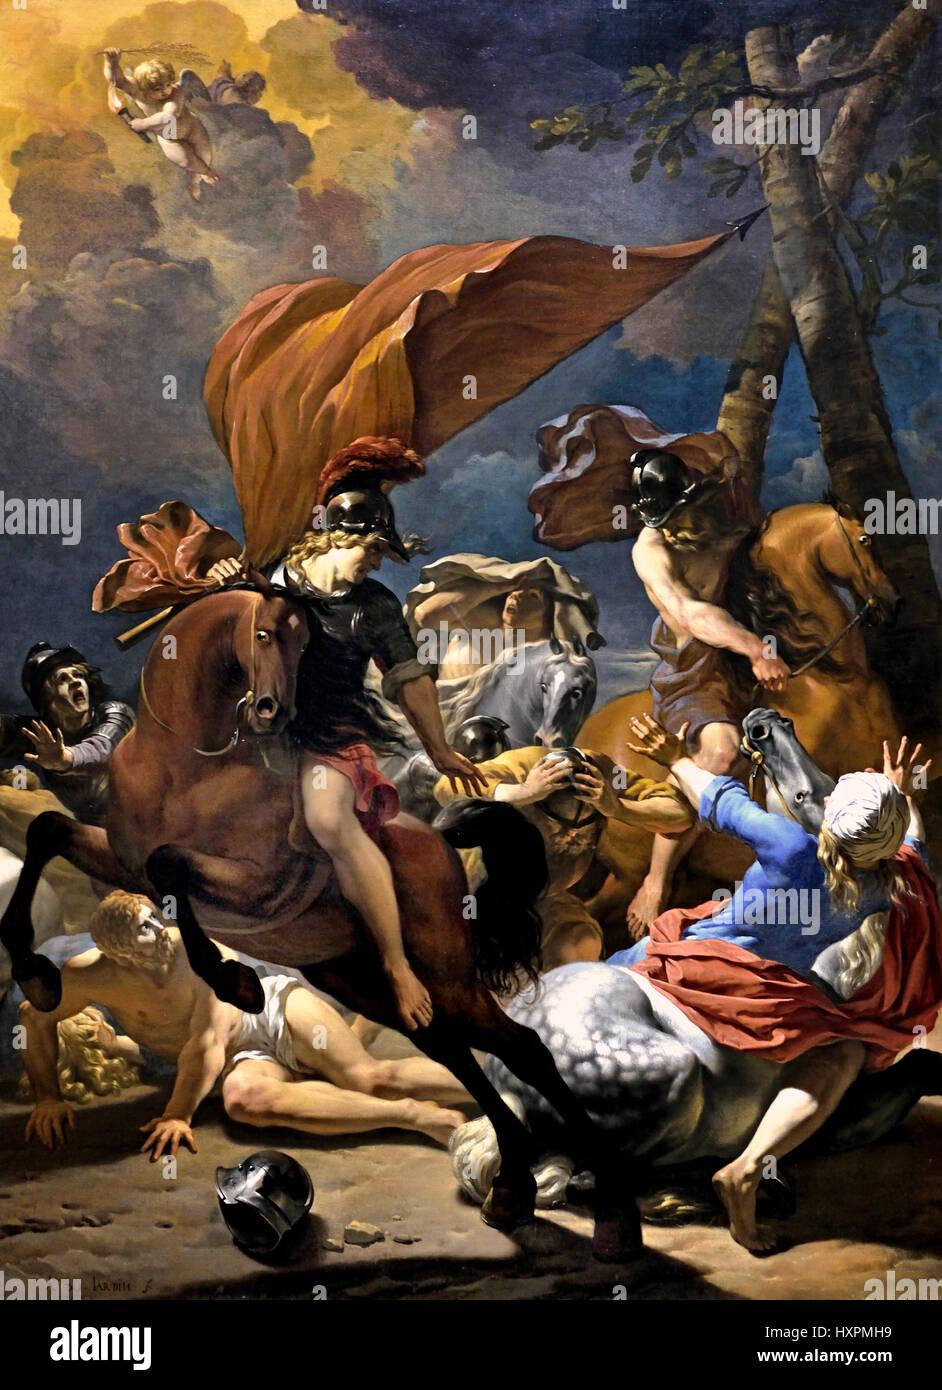 The Conversion of Saint Paul 1662 Karel Dujardin 1626 - 1678  Dutch The Netherlands - Stock Image